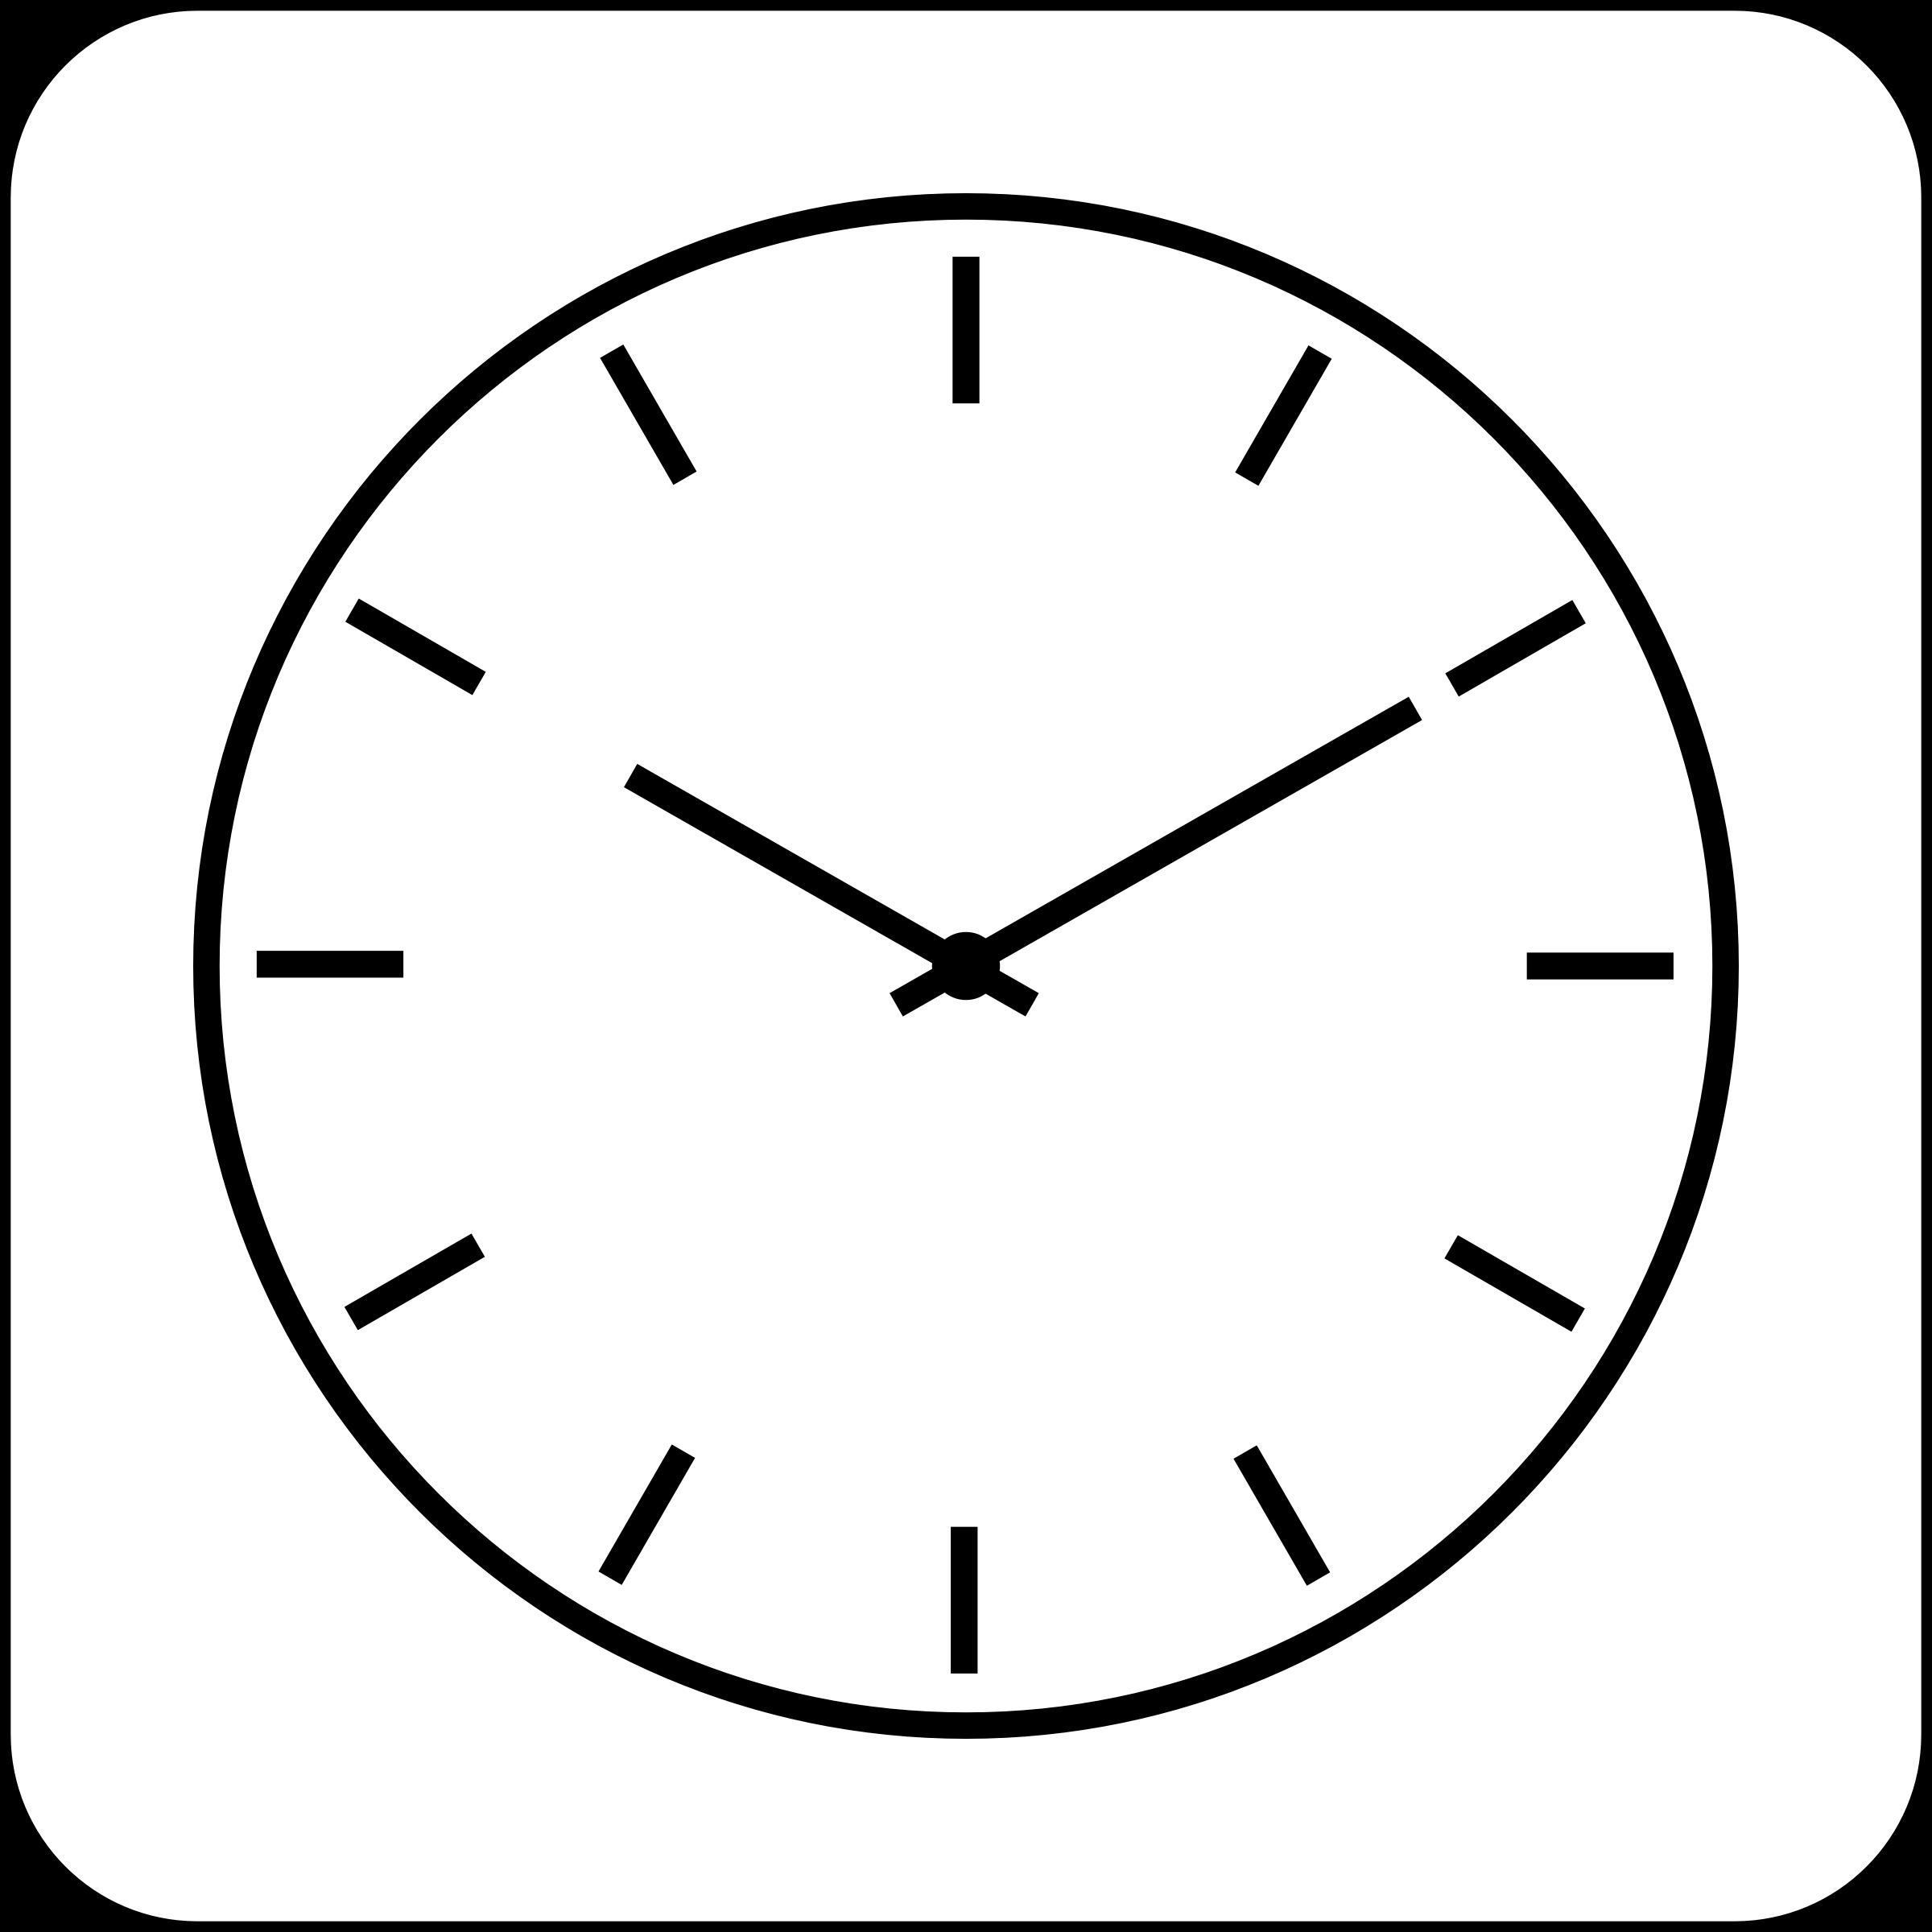 White clock icon clipart picture transparent library White Clock Icon #423717 - Free Icons Library picture transparent library